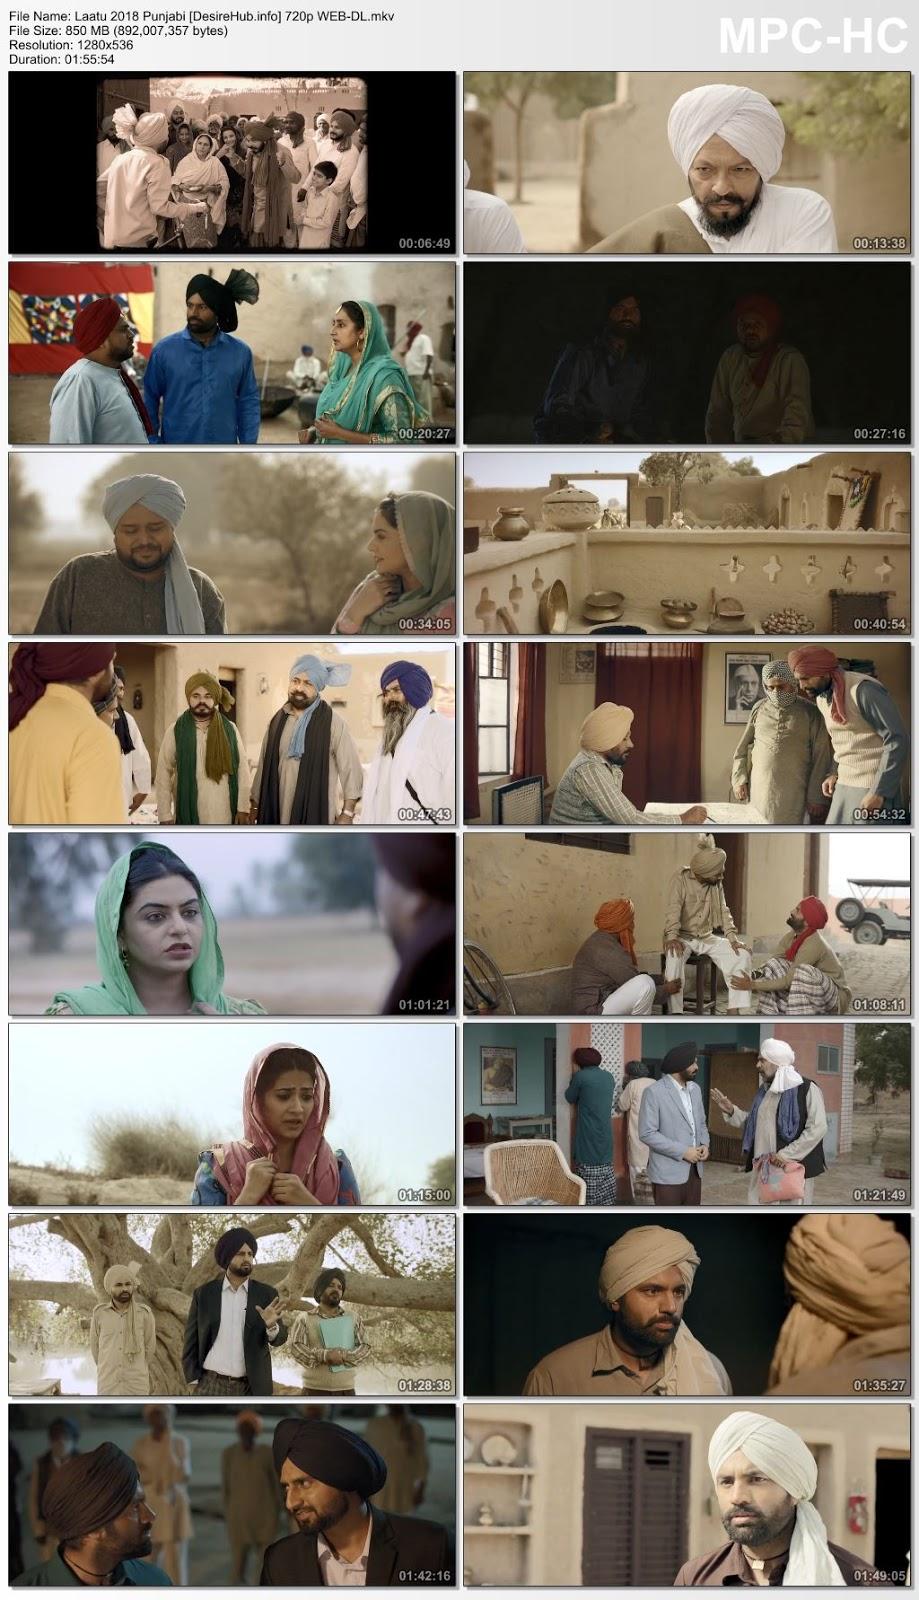 Laatu 2018 Punjabi 480p WEB-DL 300MB Desirehub